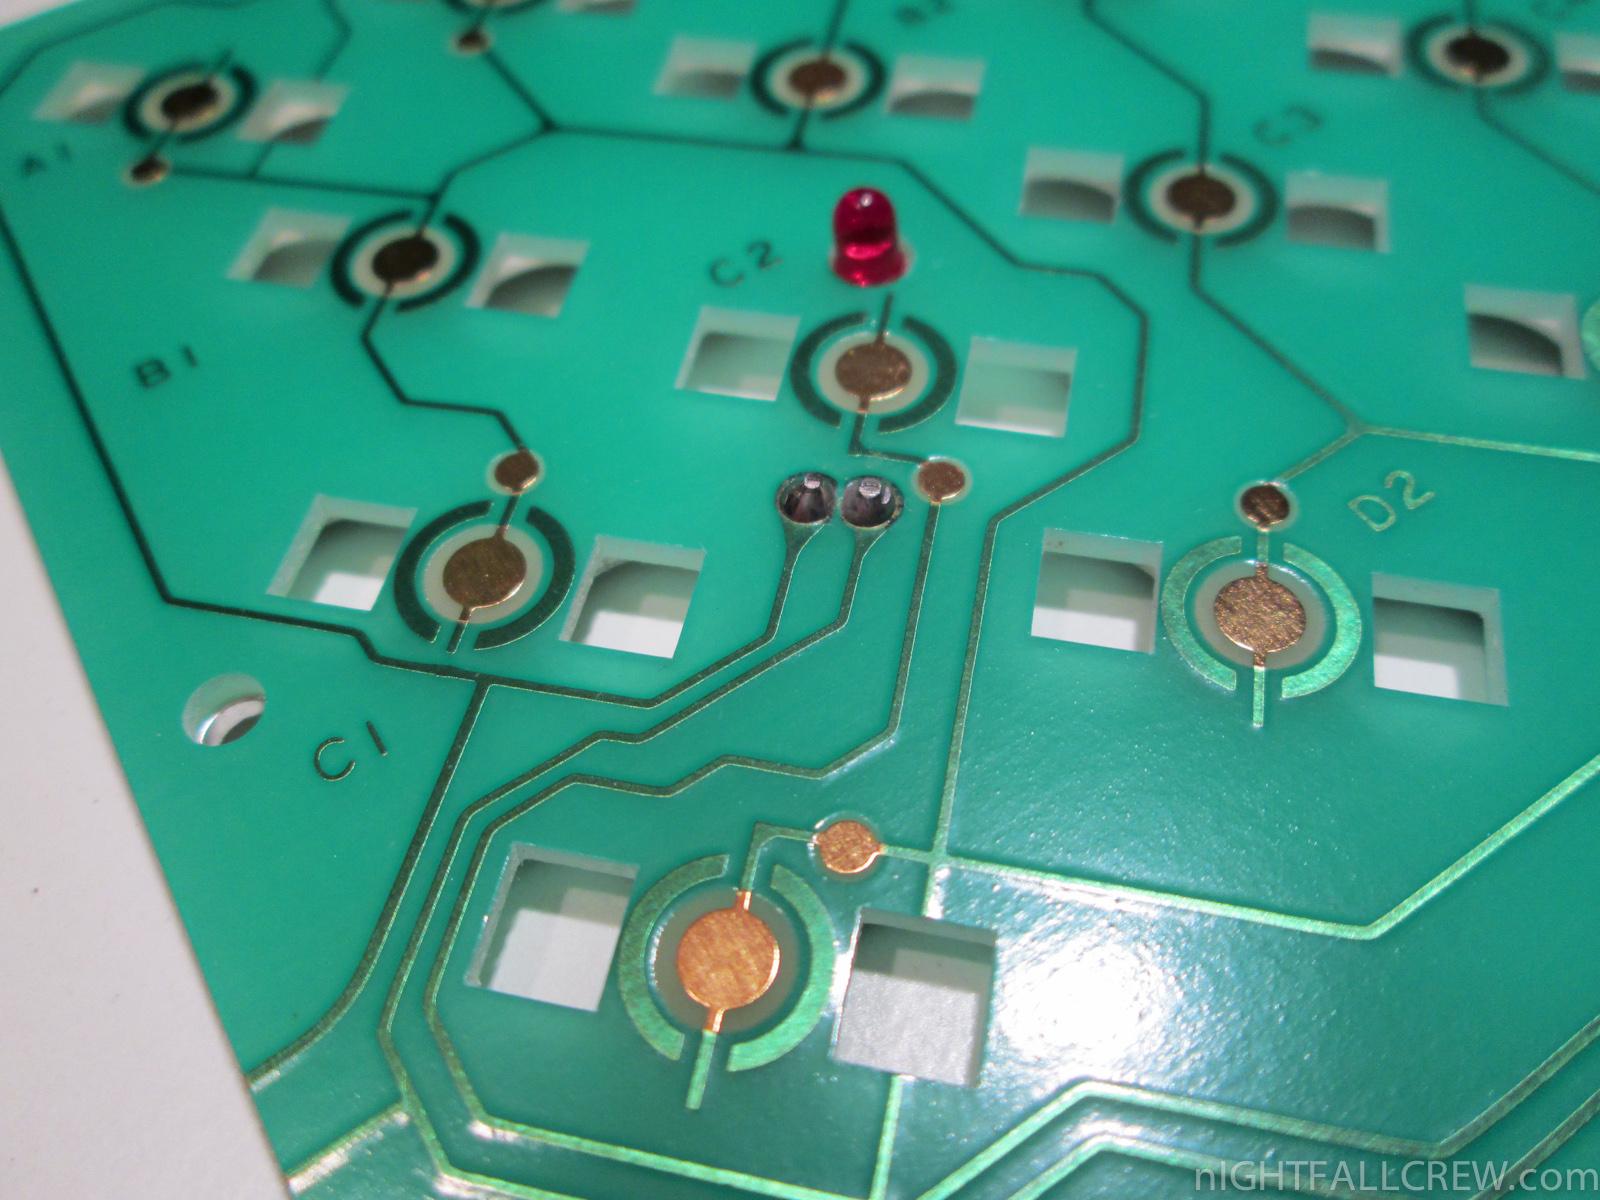 Commodore SX-64 JiffyDos installation and keyboard repair